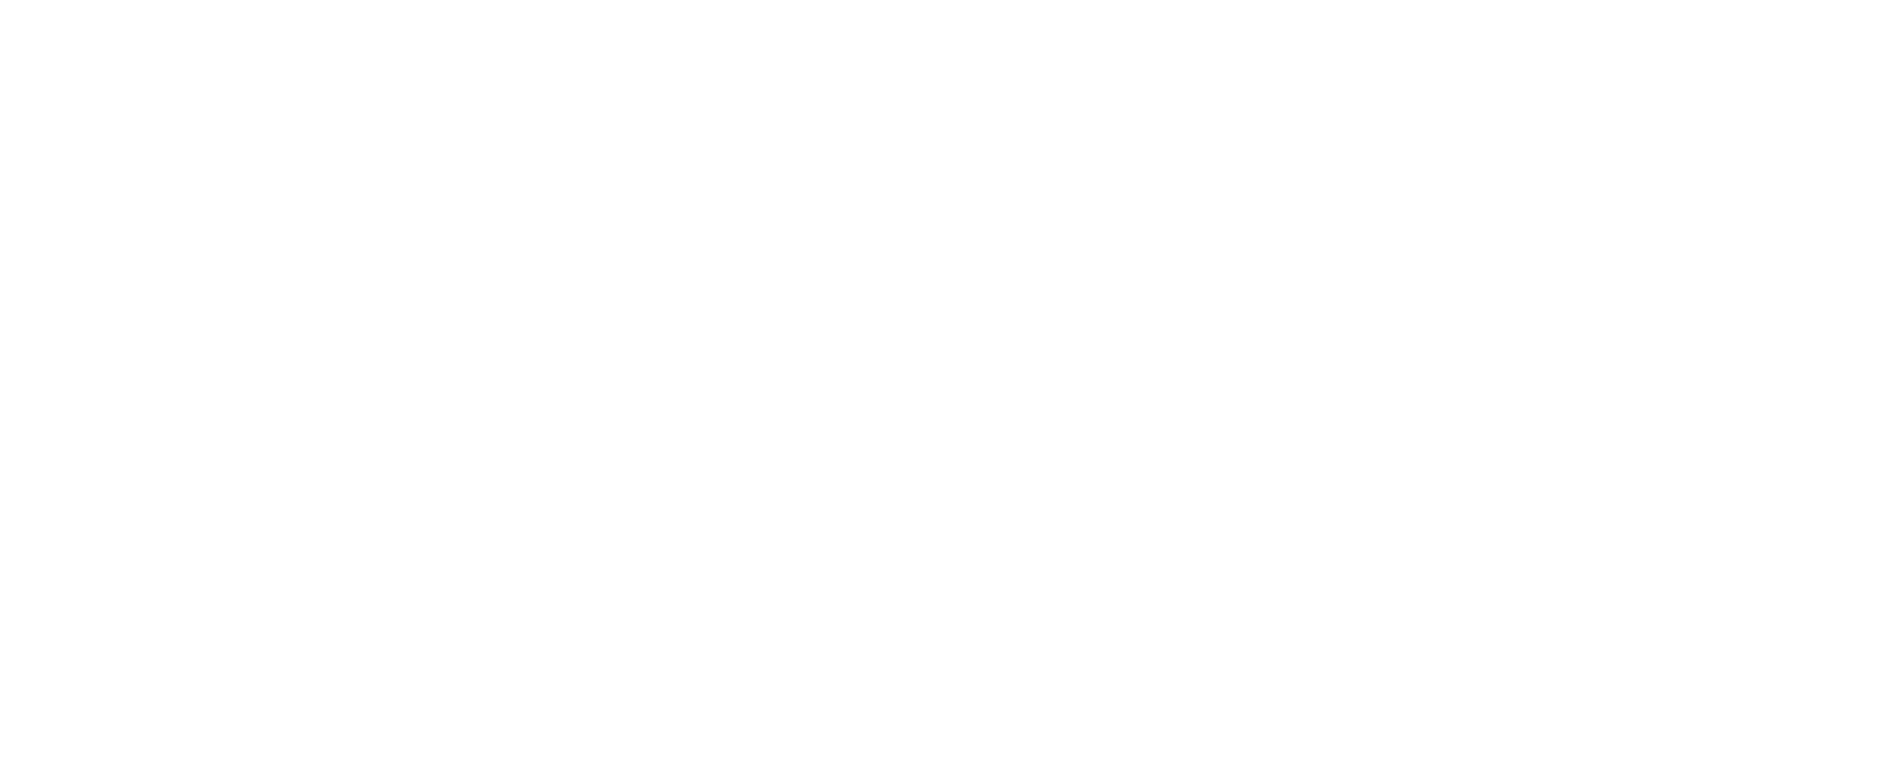 Prospectus Logo_White.png